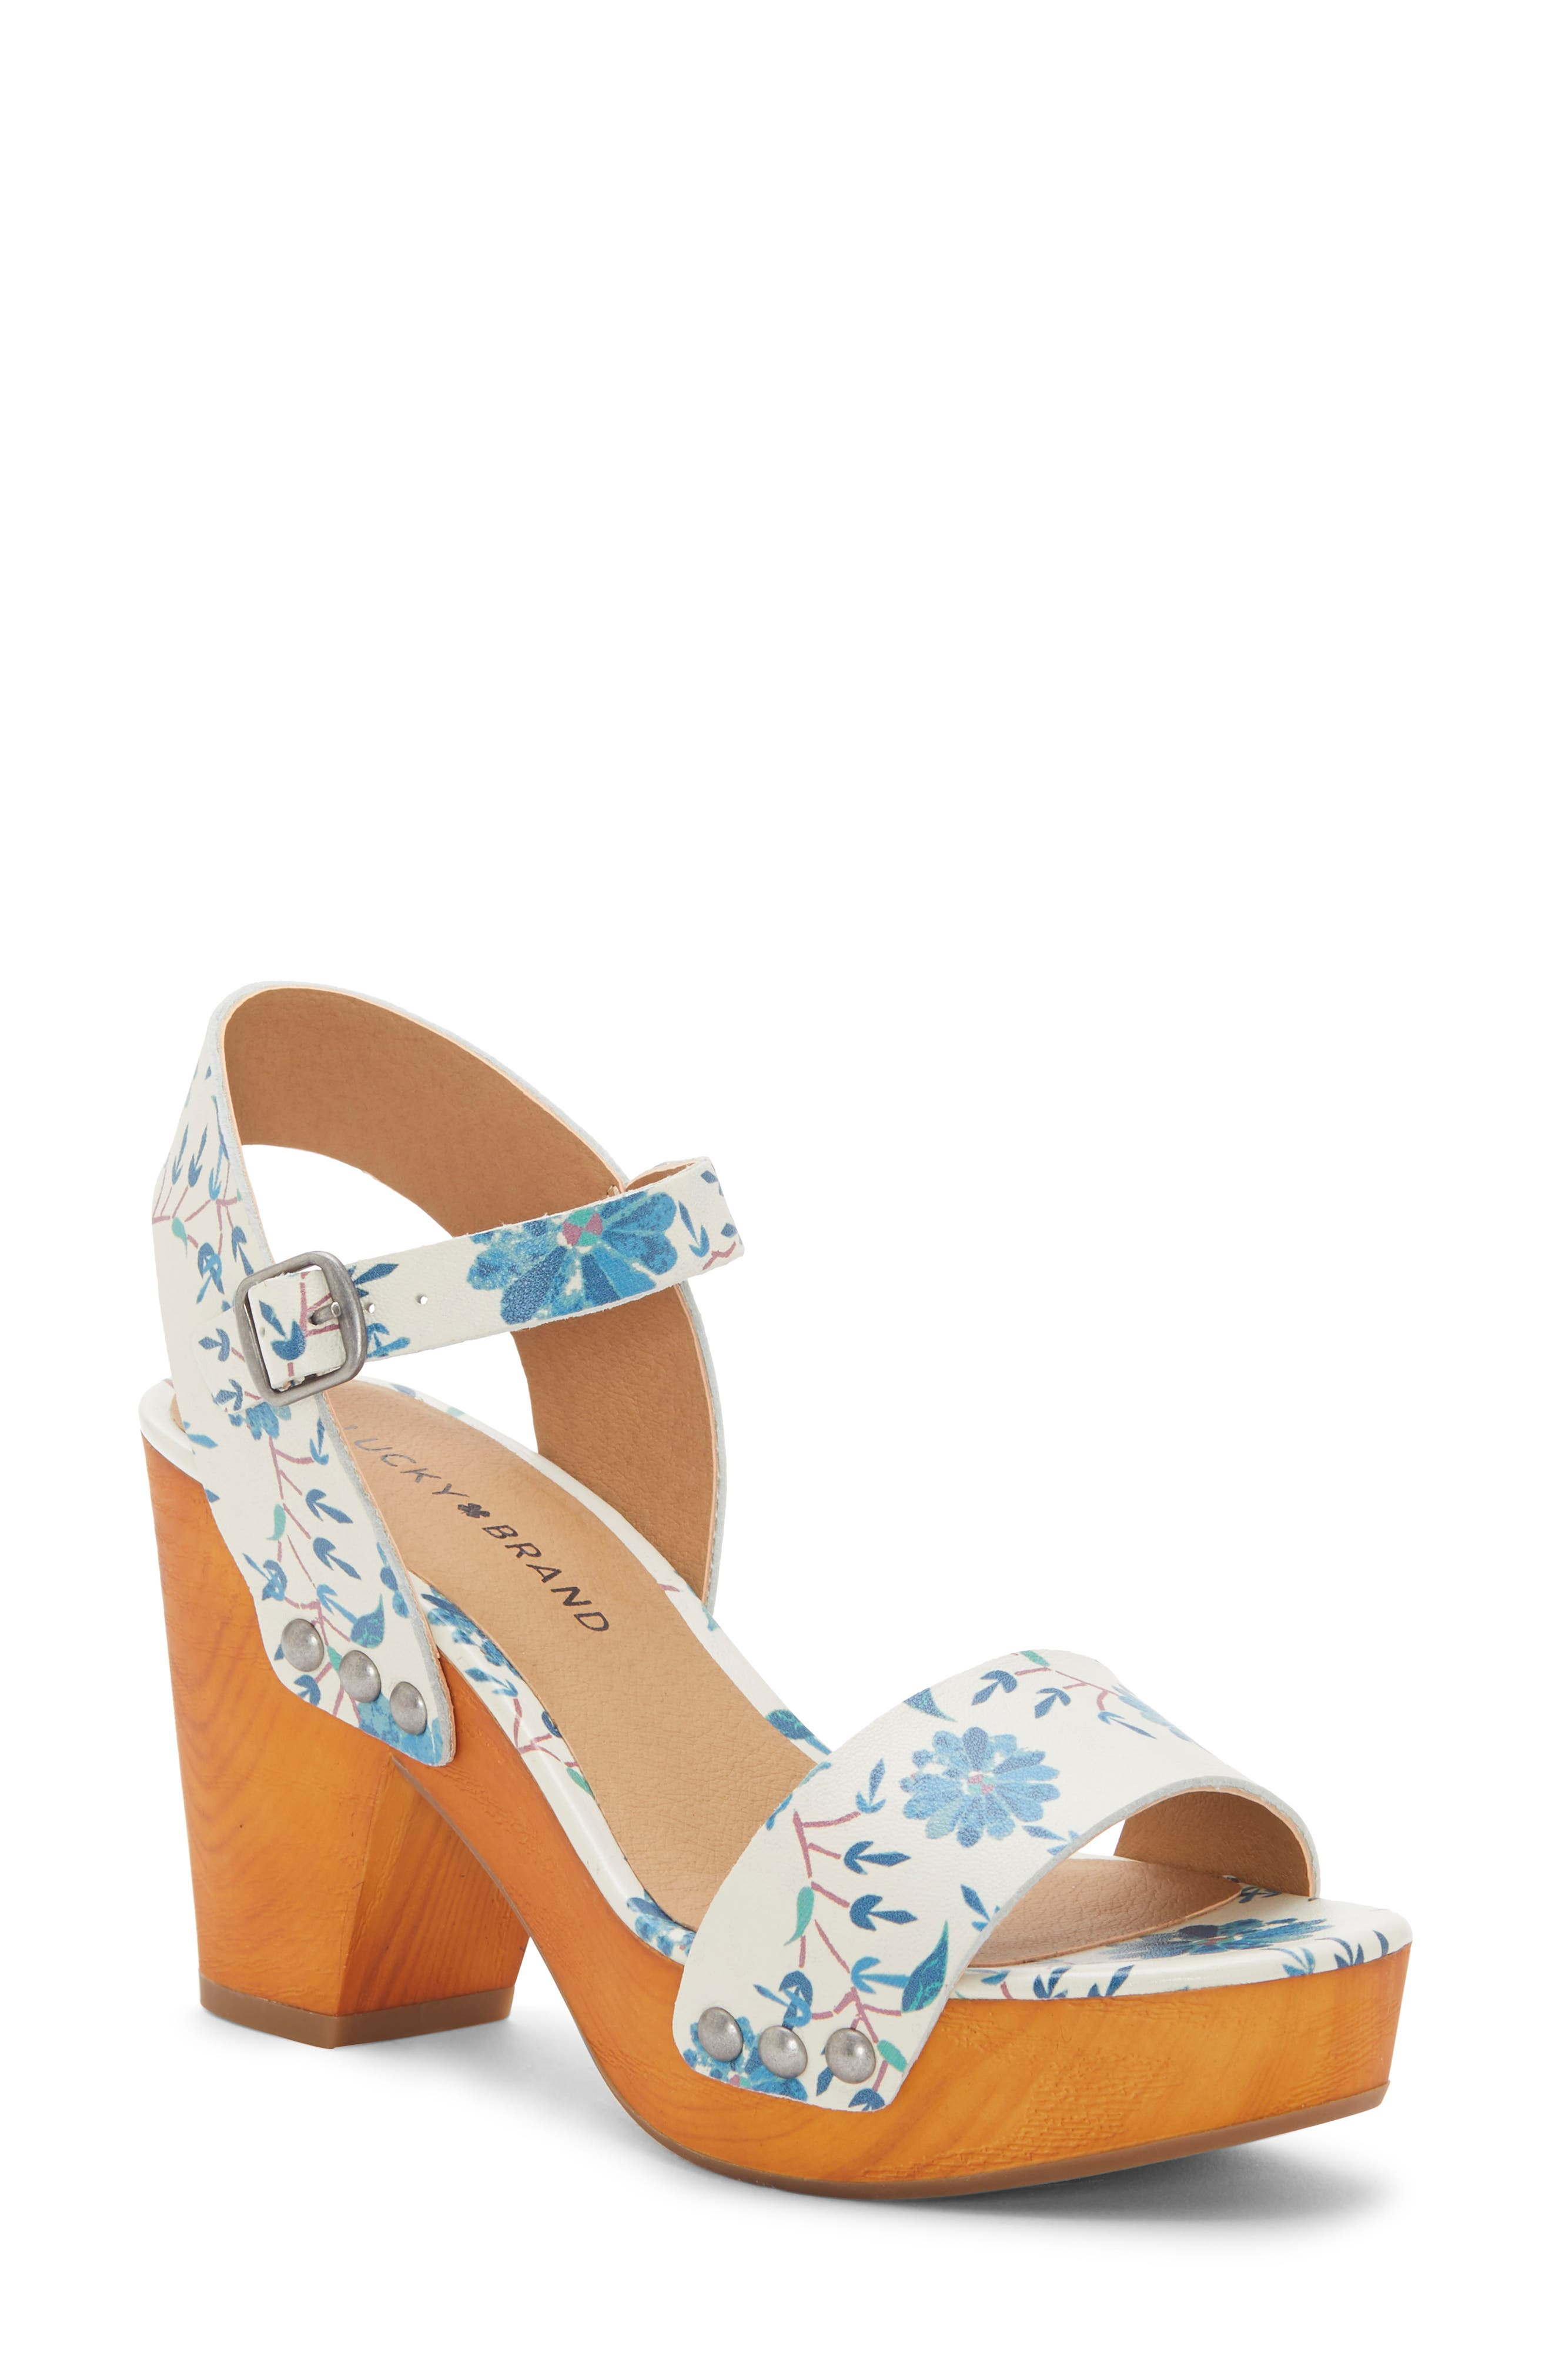 LUCKY BRAND, Trisa Platform Sandal, Main thumbnail 1, color, BIRCH LEATHER